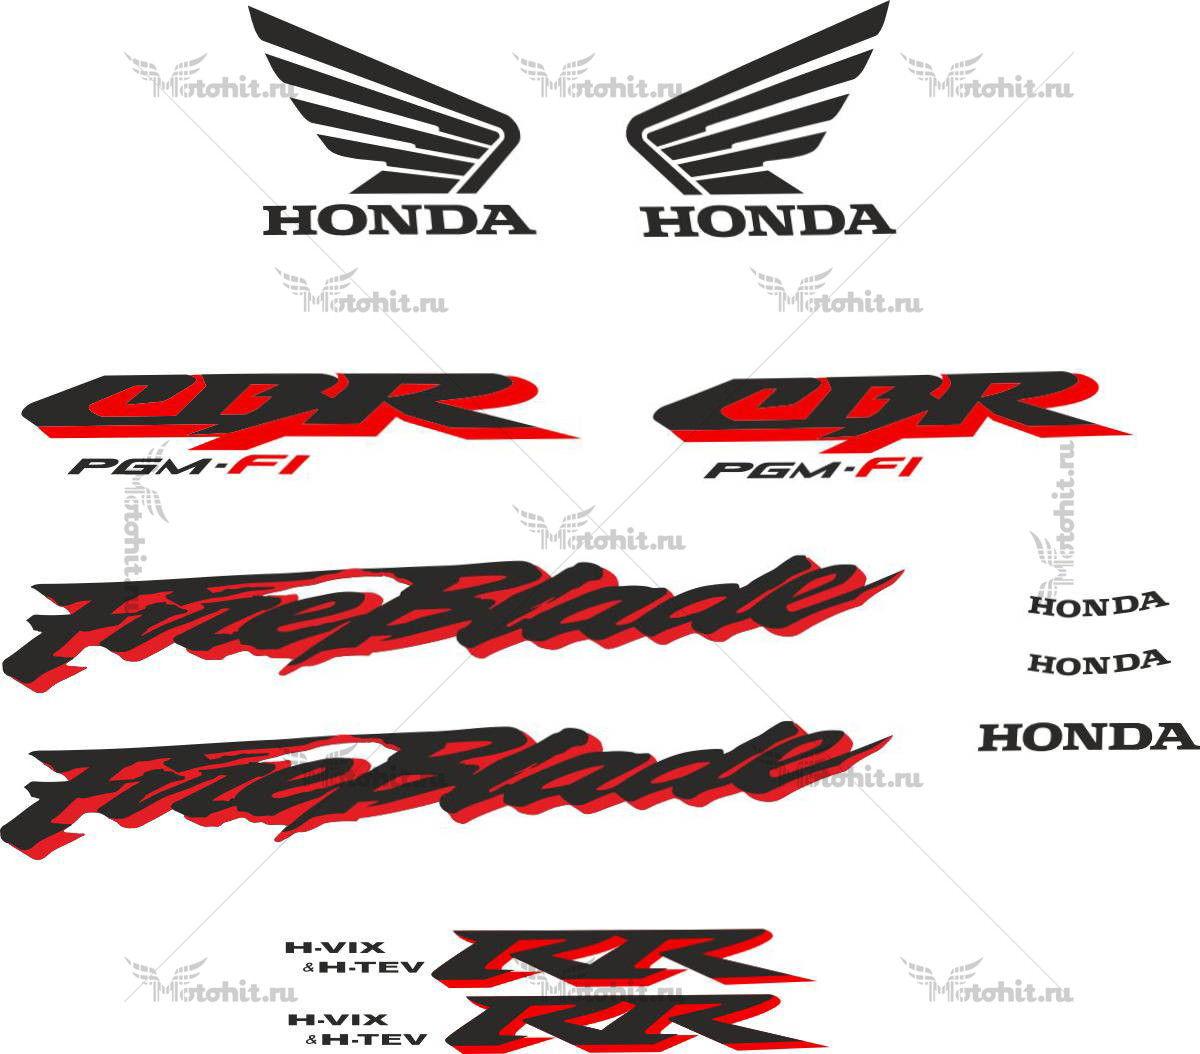 Комплект наклеек Honda CBR-900-RR 2001 SILVER